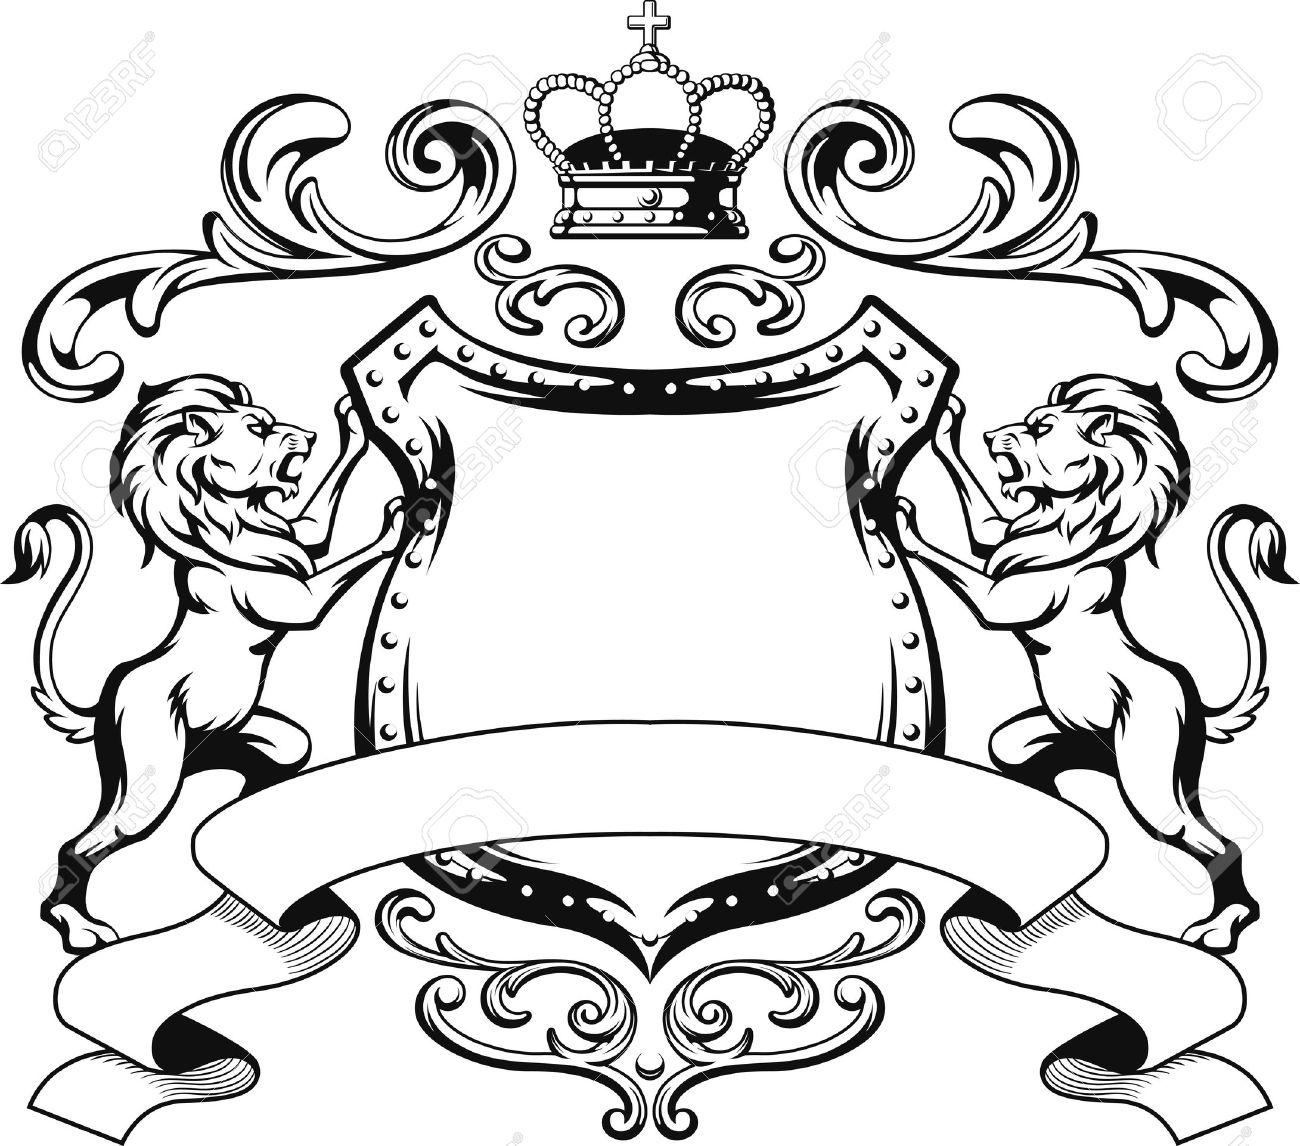 Heraldic Lion Shield Crest Silhouette.